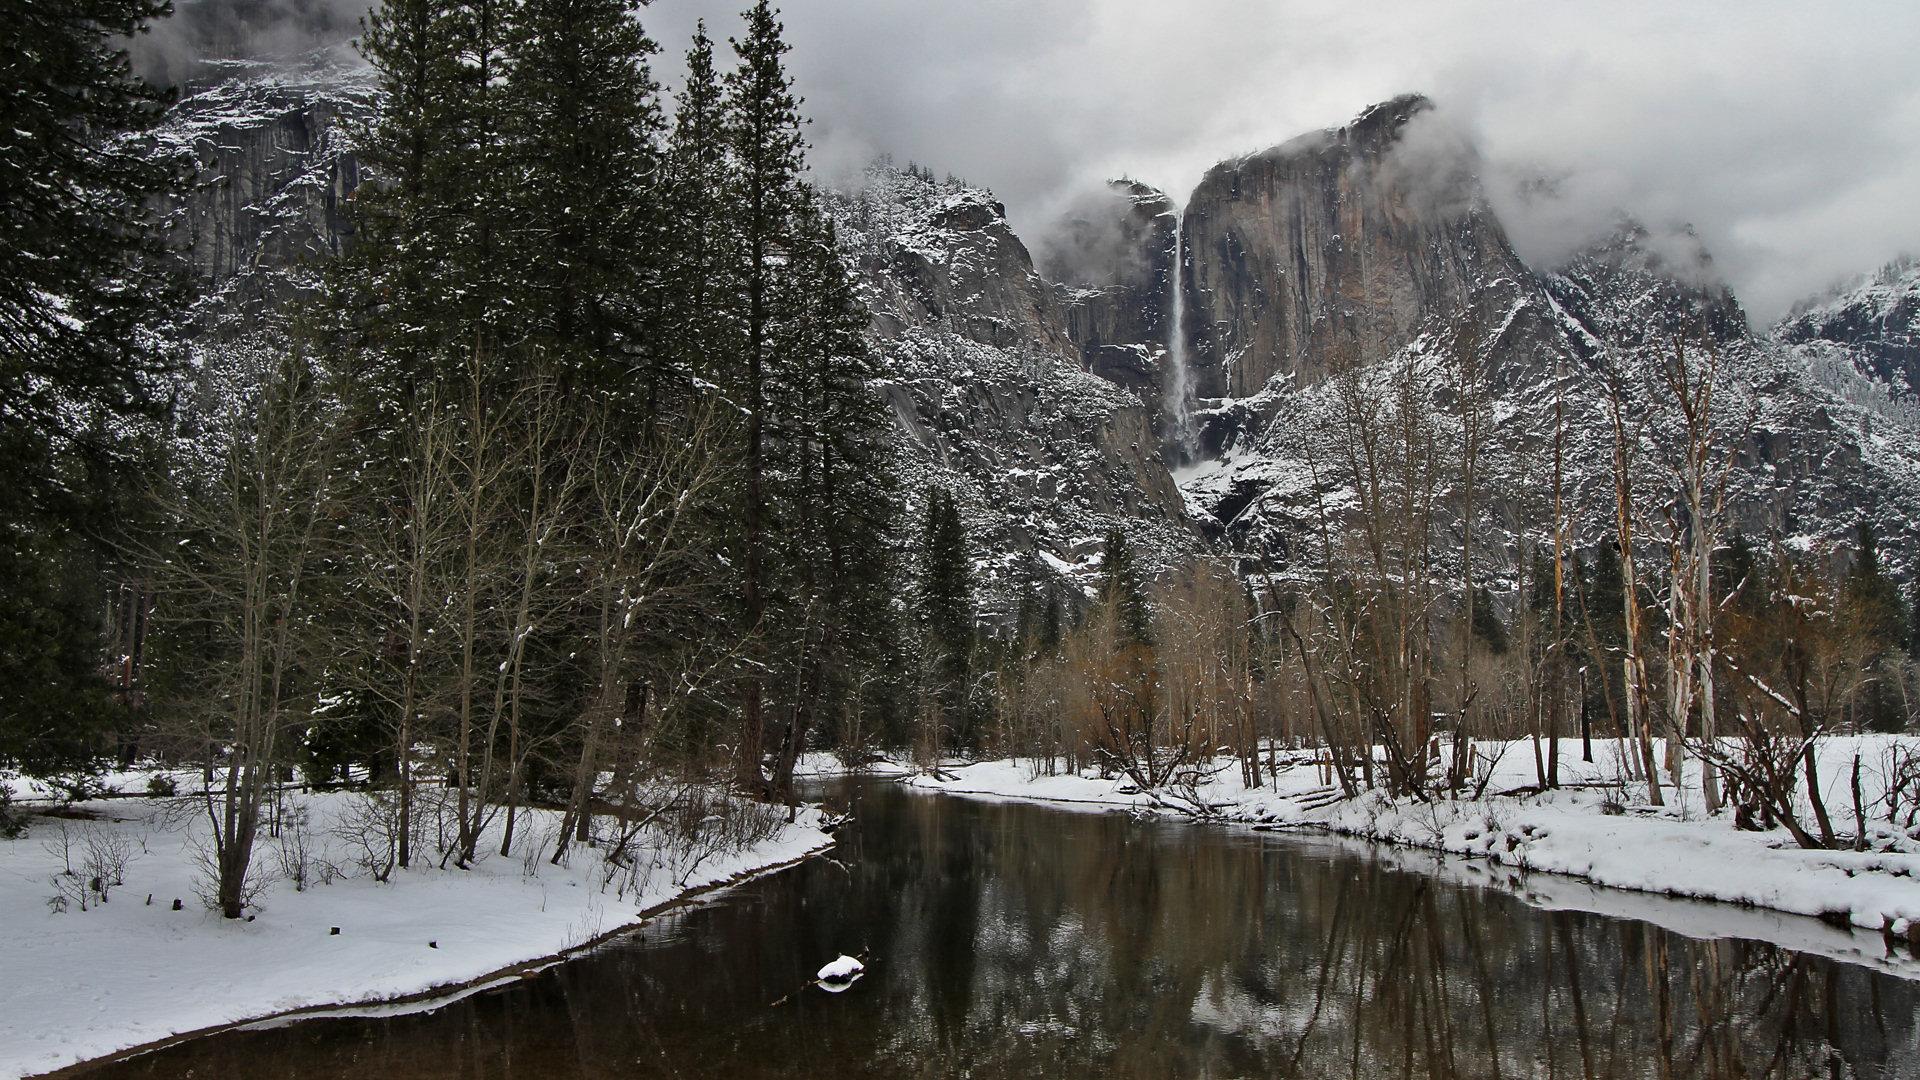 Wallpaper Falling Off Yosemite Wallpaper The Swinging Bridge In Winter